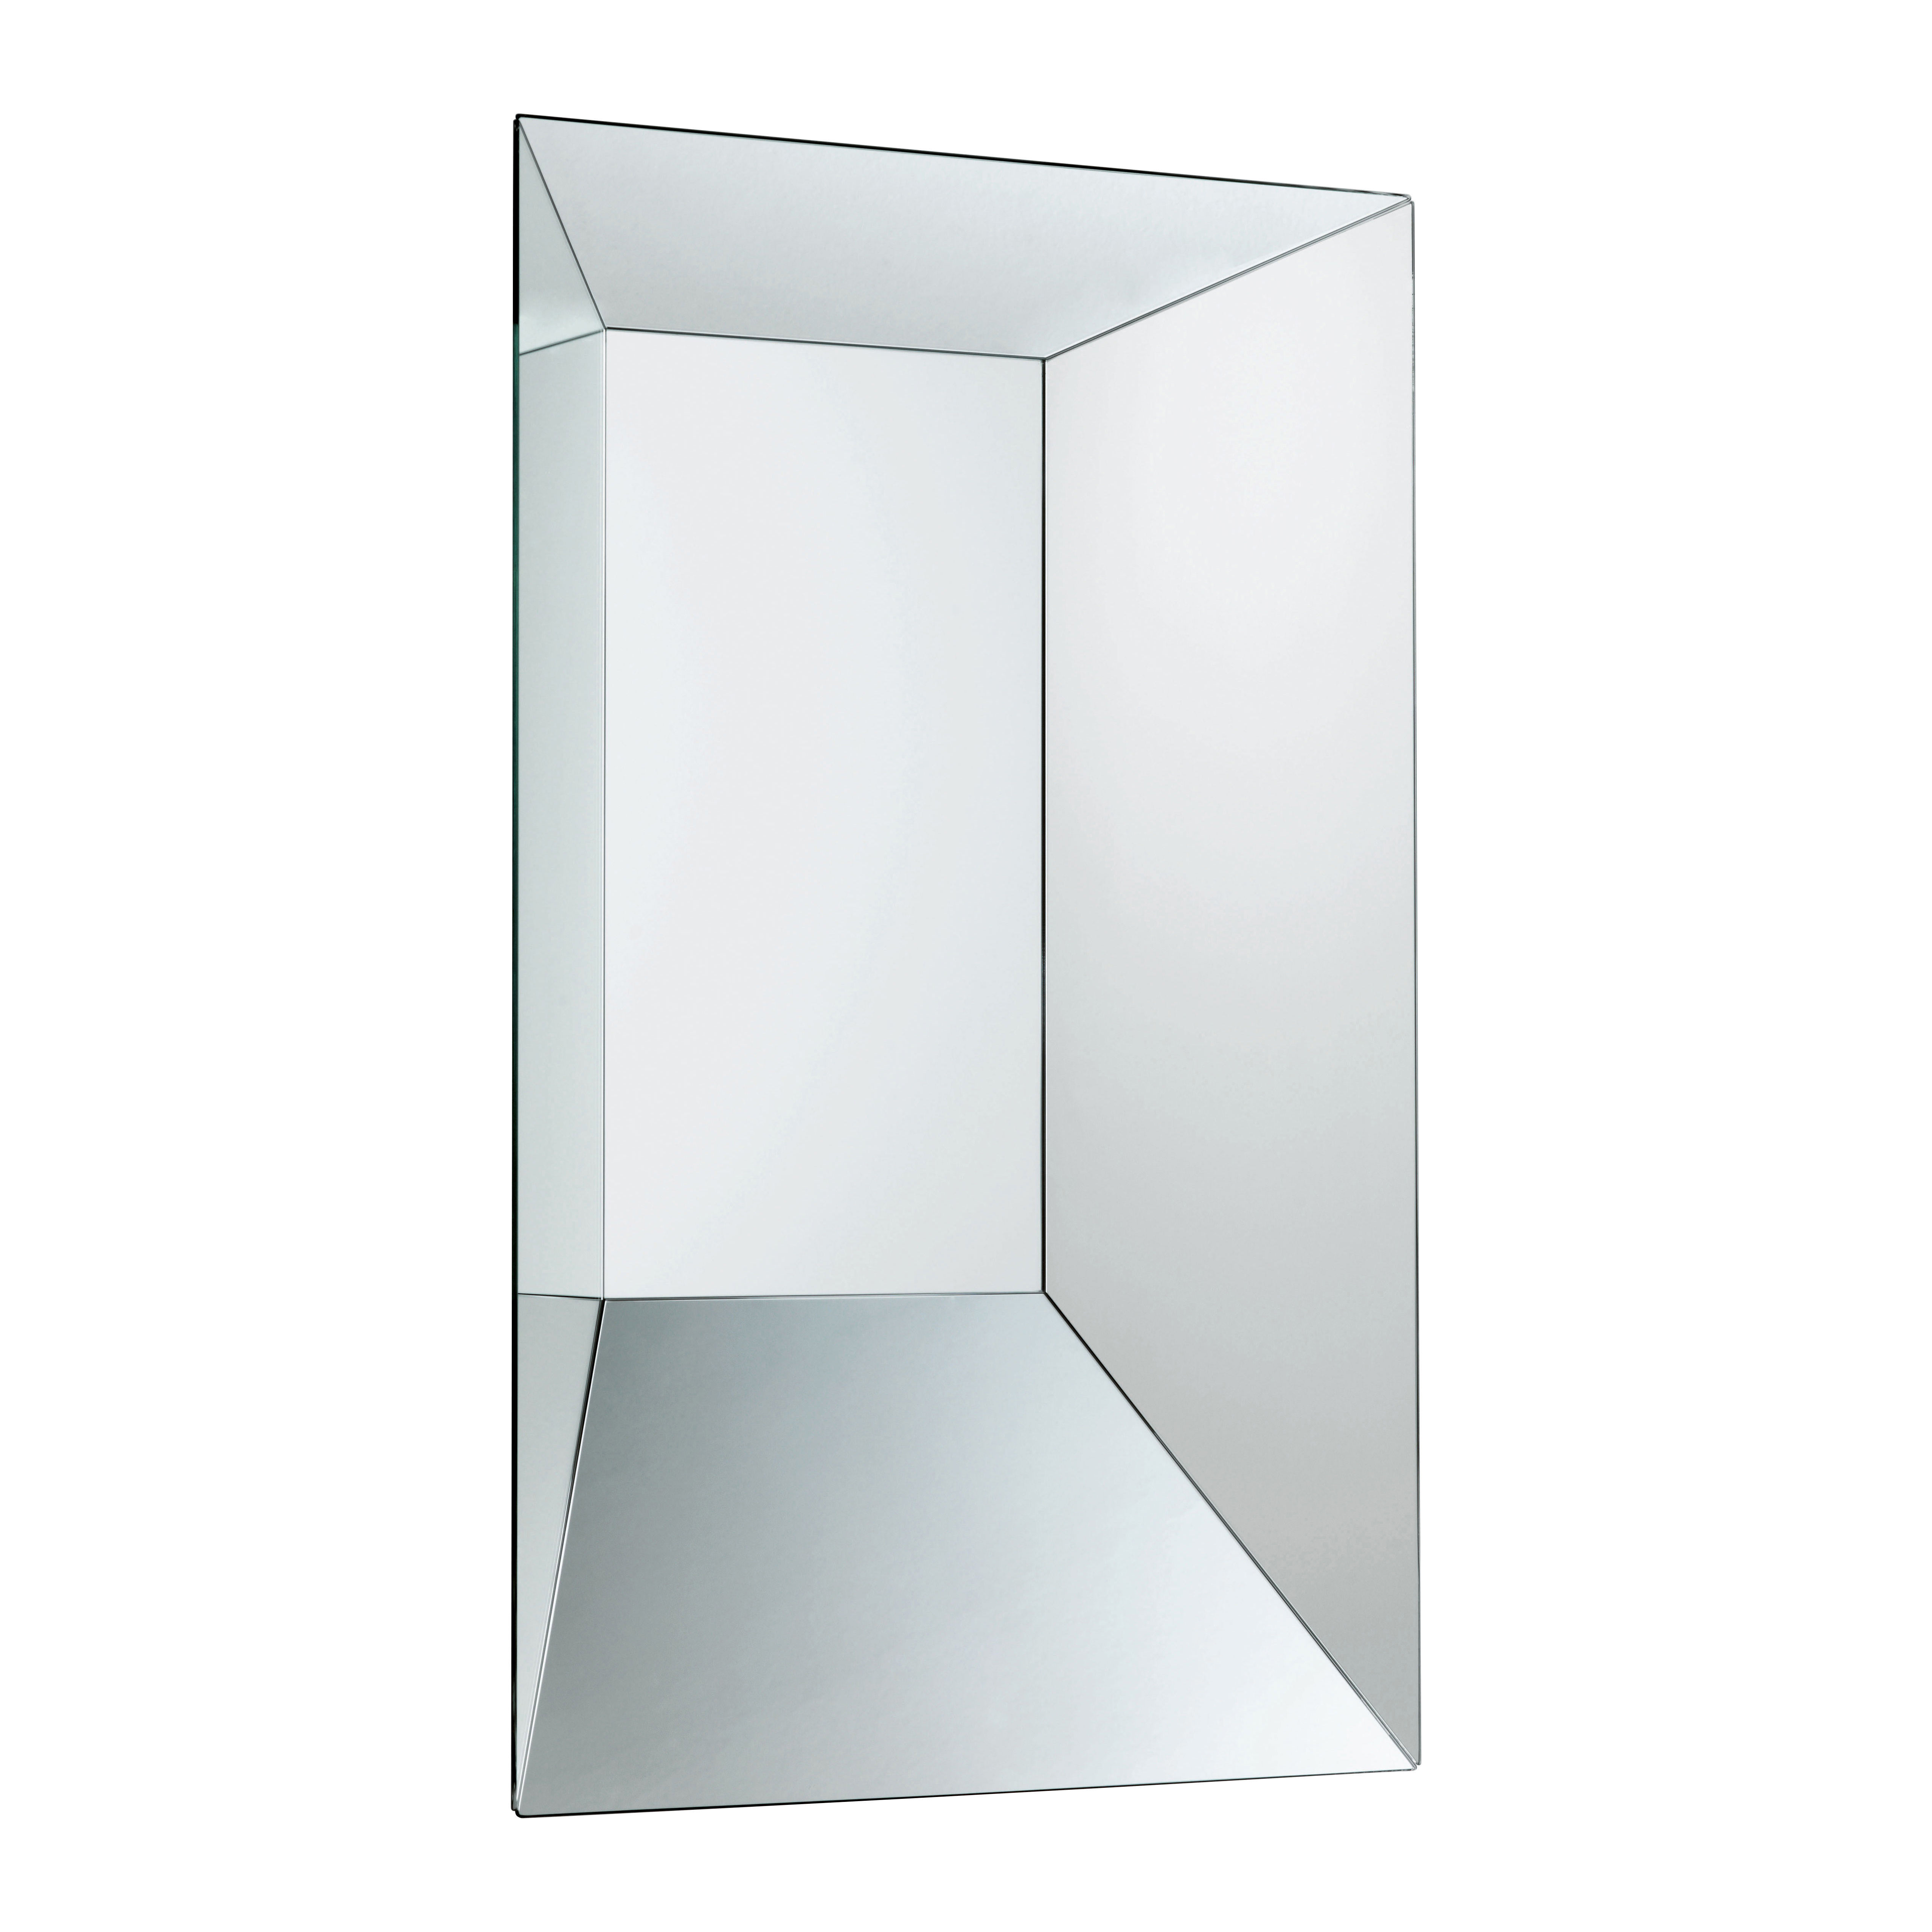 Leon battista wall mirror 50 x 70 cm 50 x 70 cm by glas for Miroir 70 x 70